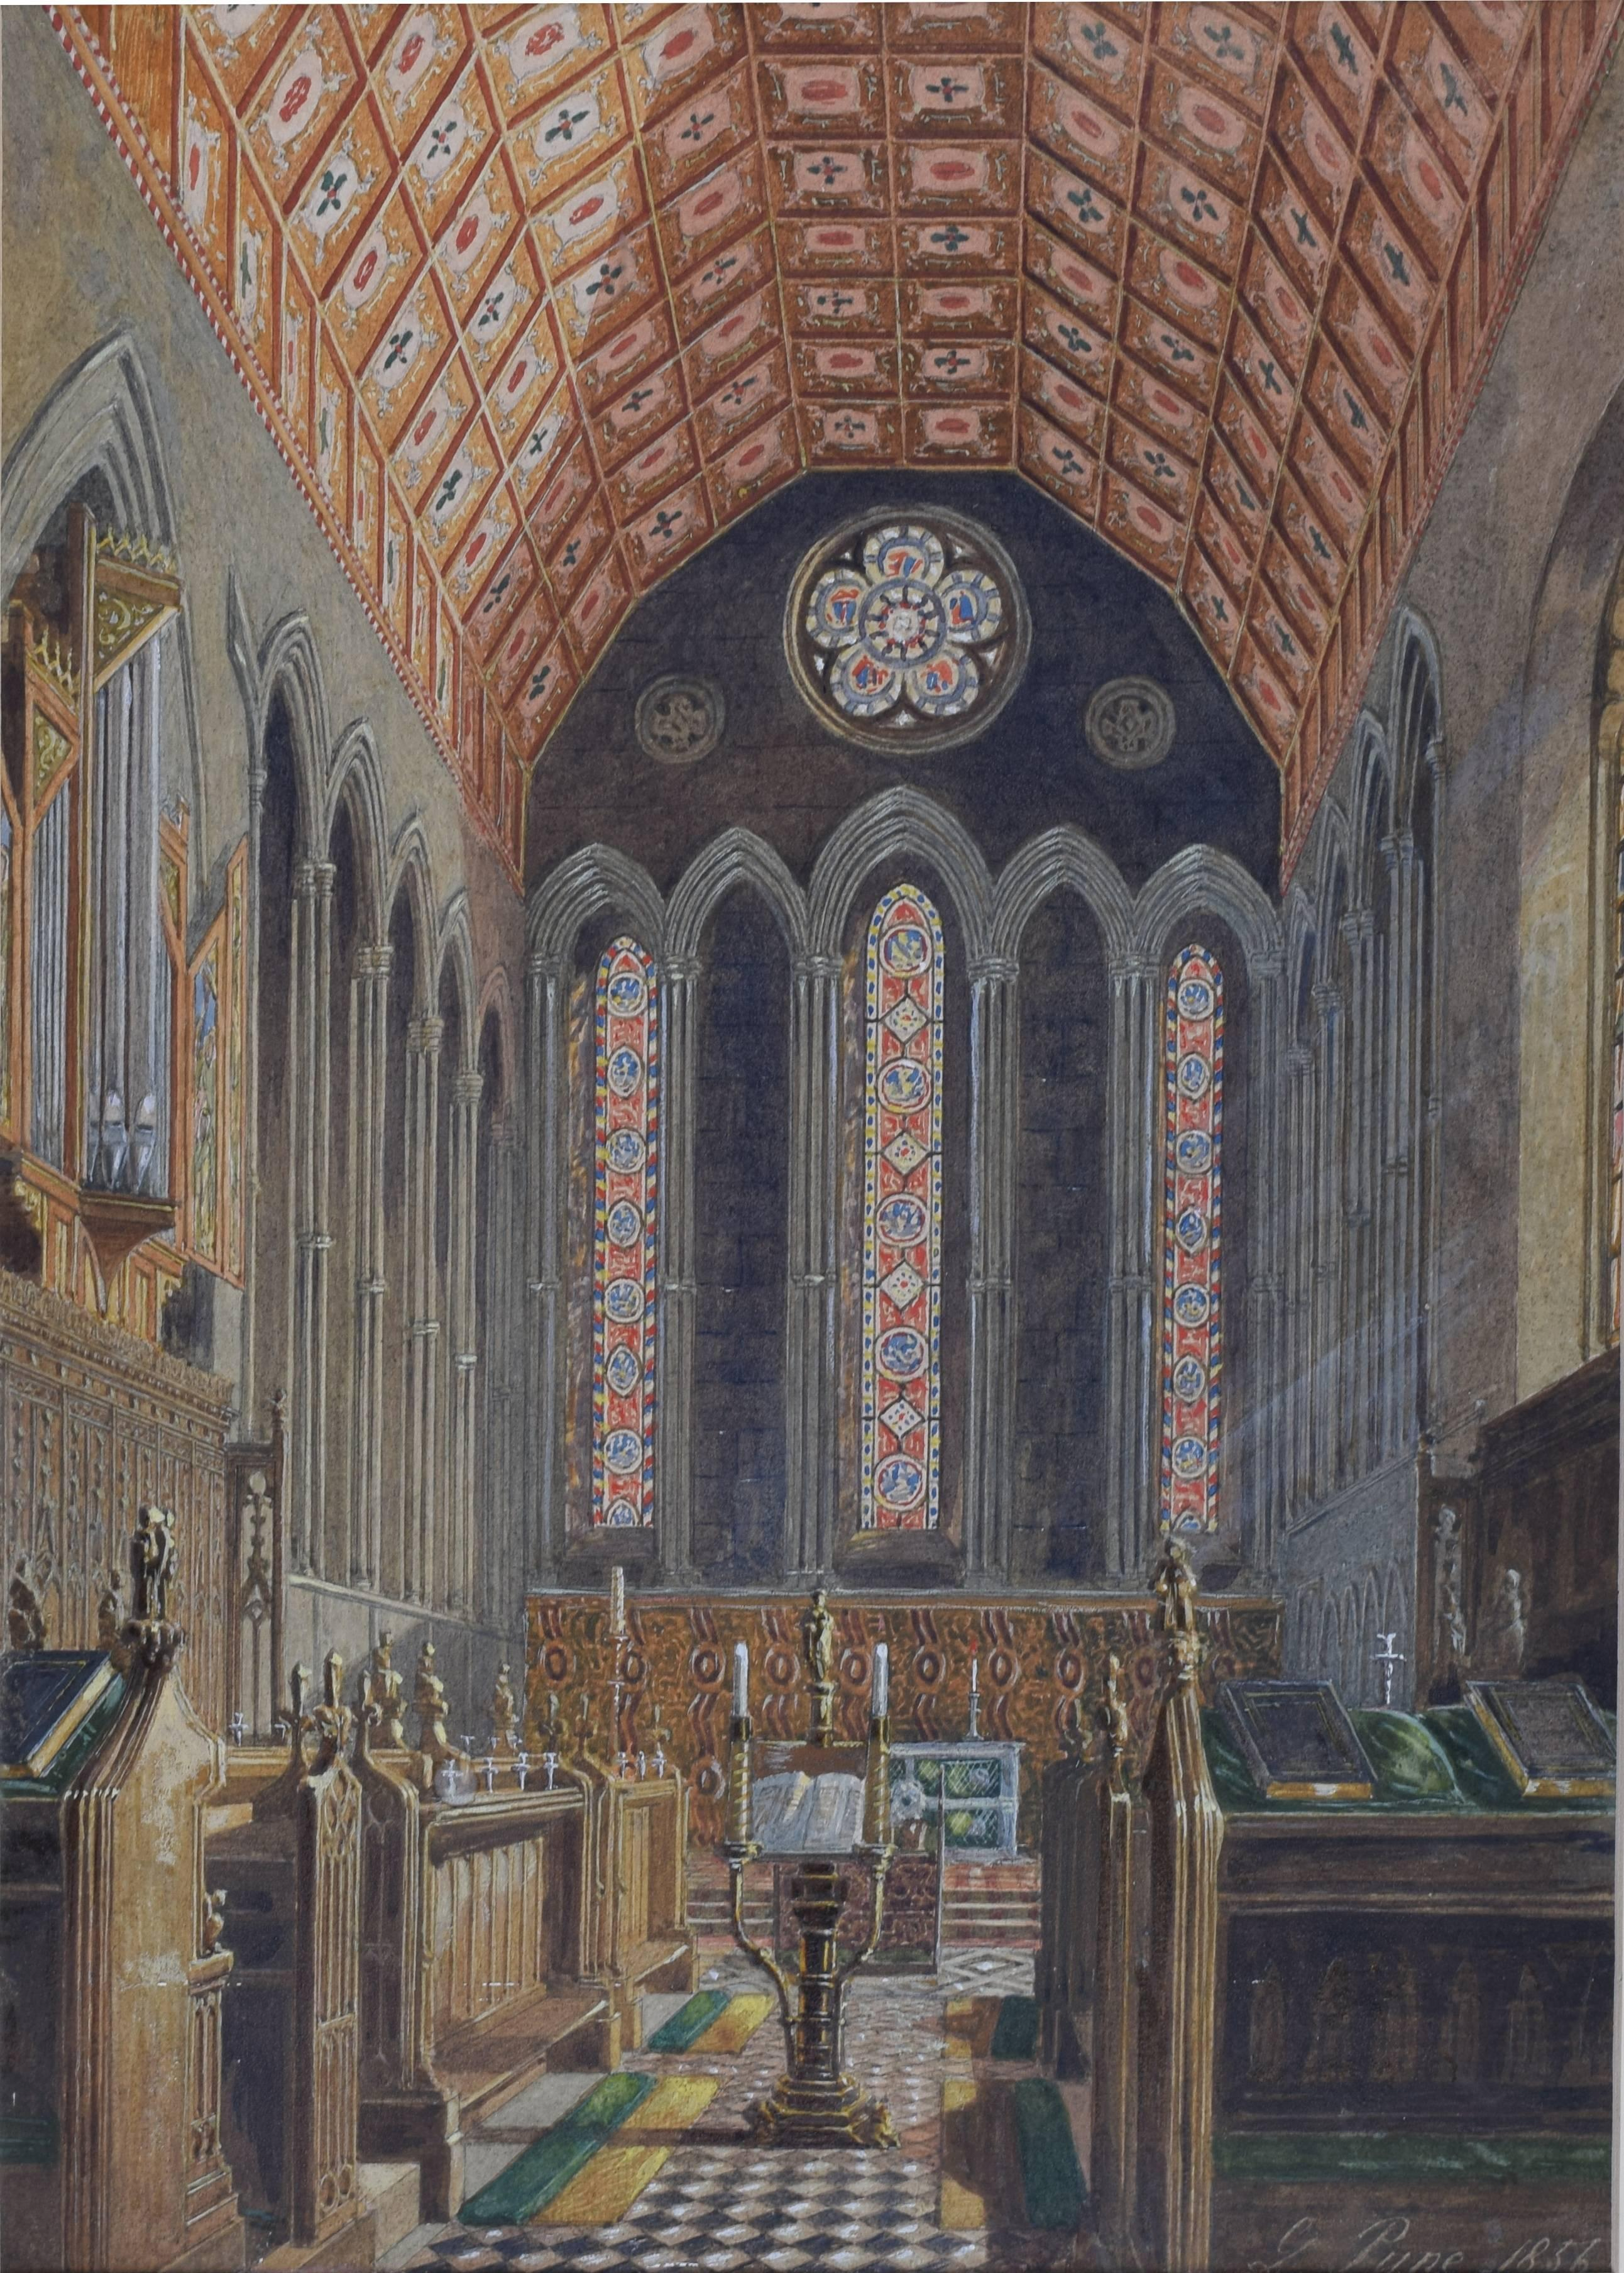 George Pyne Jesus College, Cambridge, Pugin Chapel 1856 watercolour